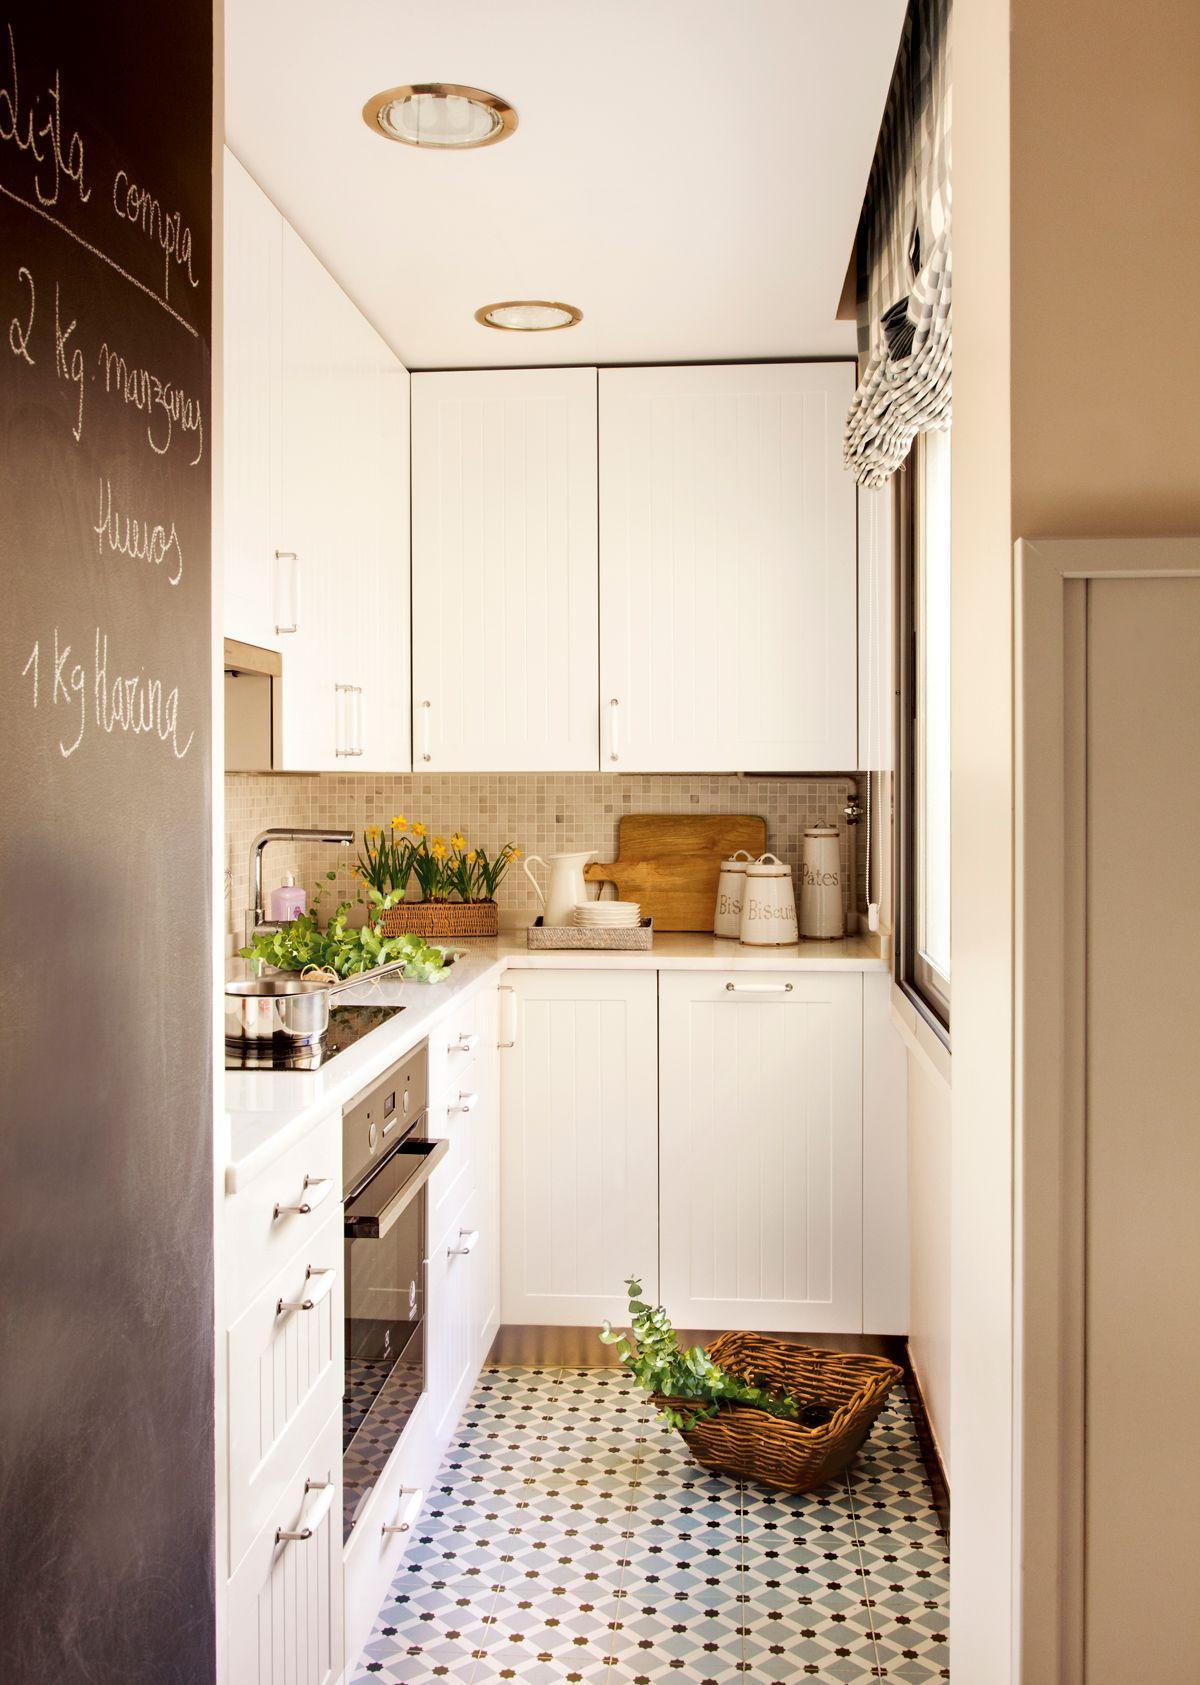 10 ideas geniales para cocinas reales home pinterest for Cocinas chiquitas